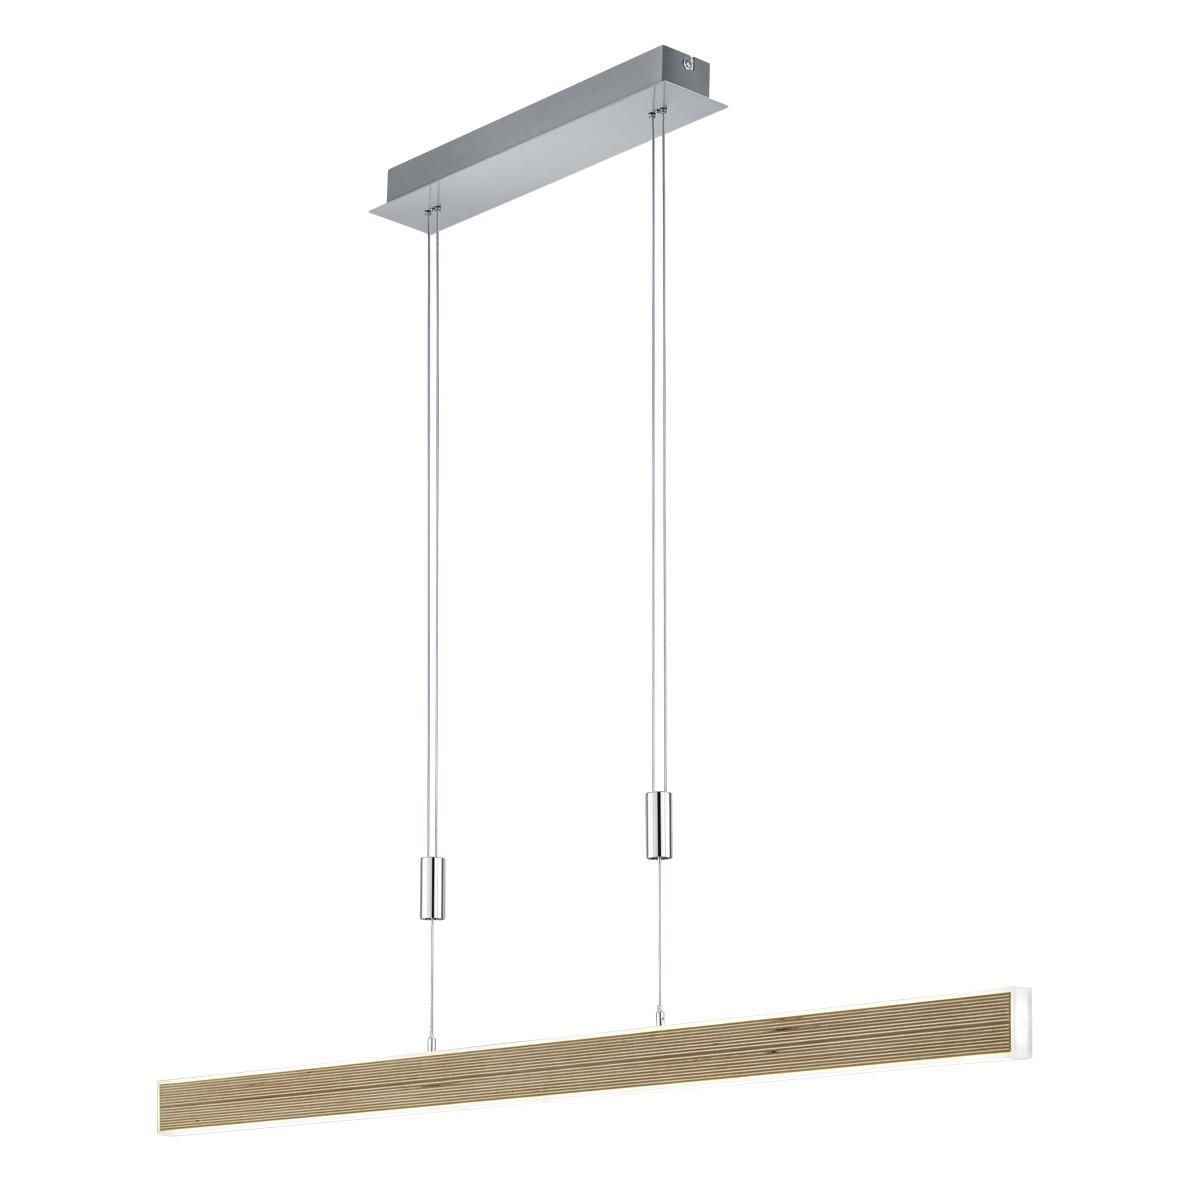 B-Leuchten Kiruna Wood Pendelleuchte, Multiplex Birke / Nickel matt